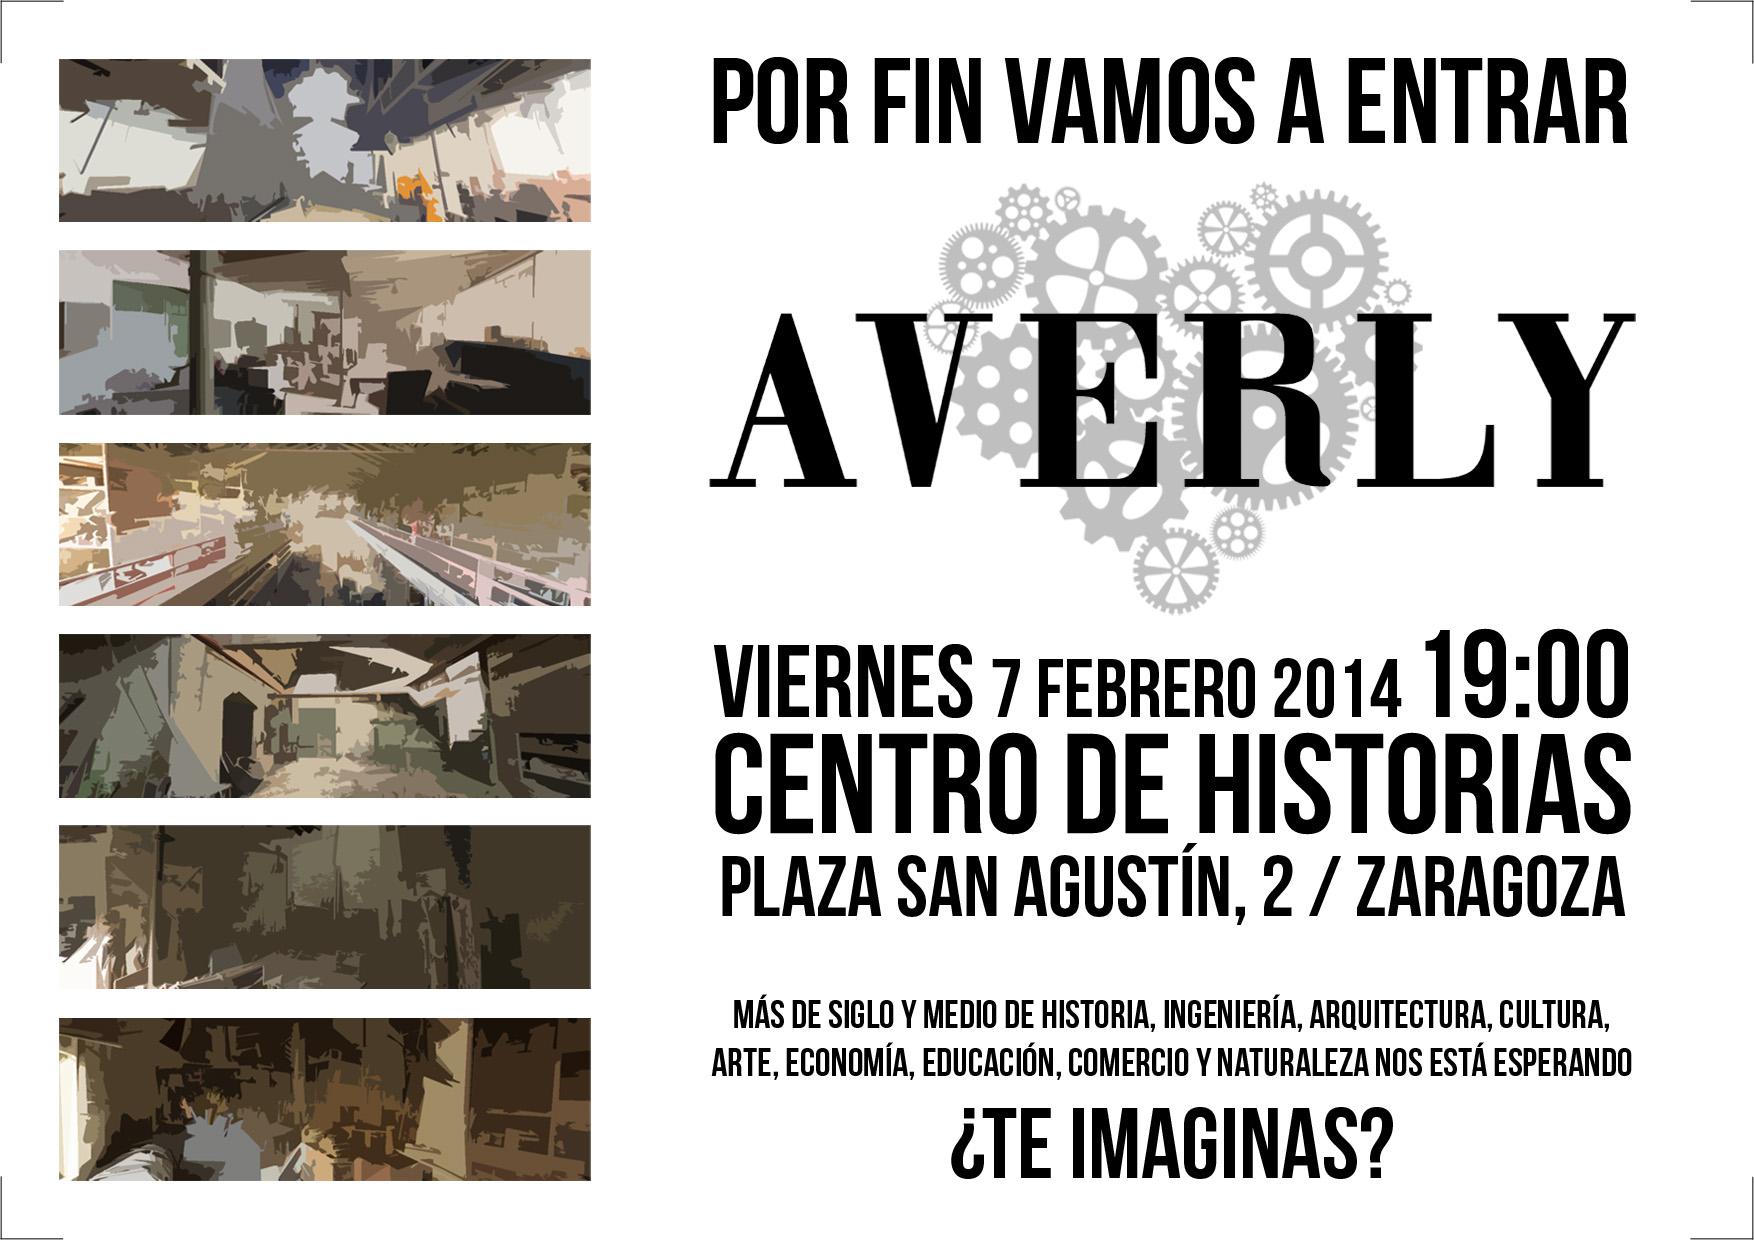 Averly-DG-2014.02.07-Octavilla Averly